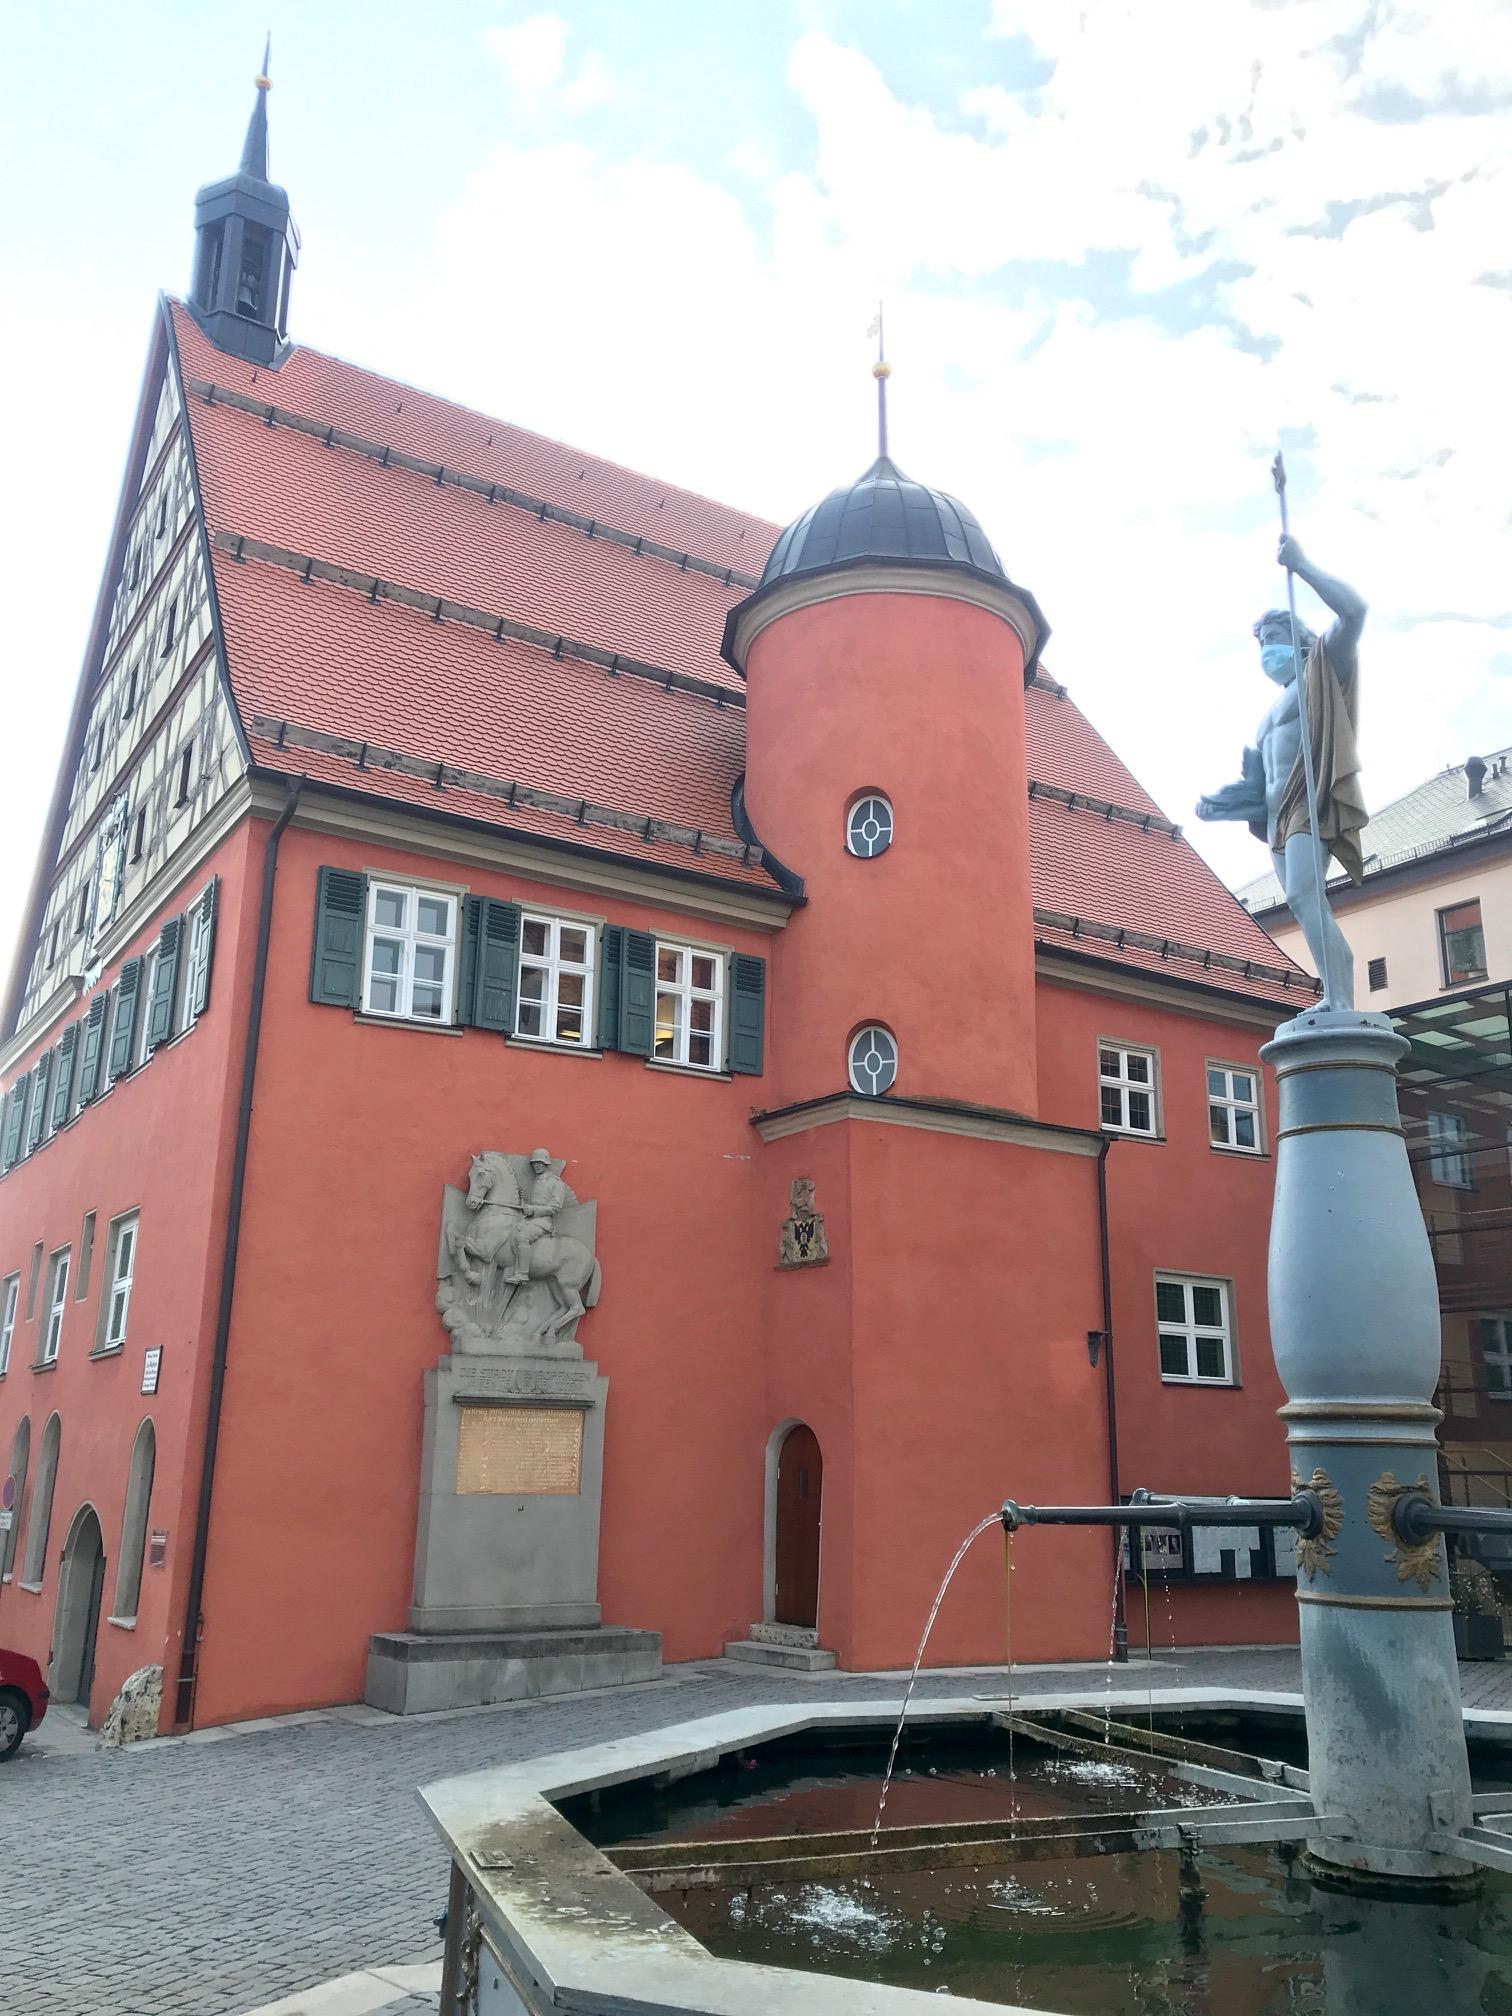 Albsteig HW1, Etappe 3 Bopfingen Unterkochen, Start am Rathaus